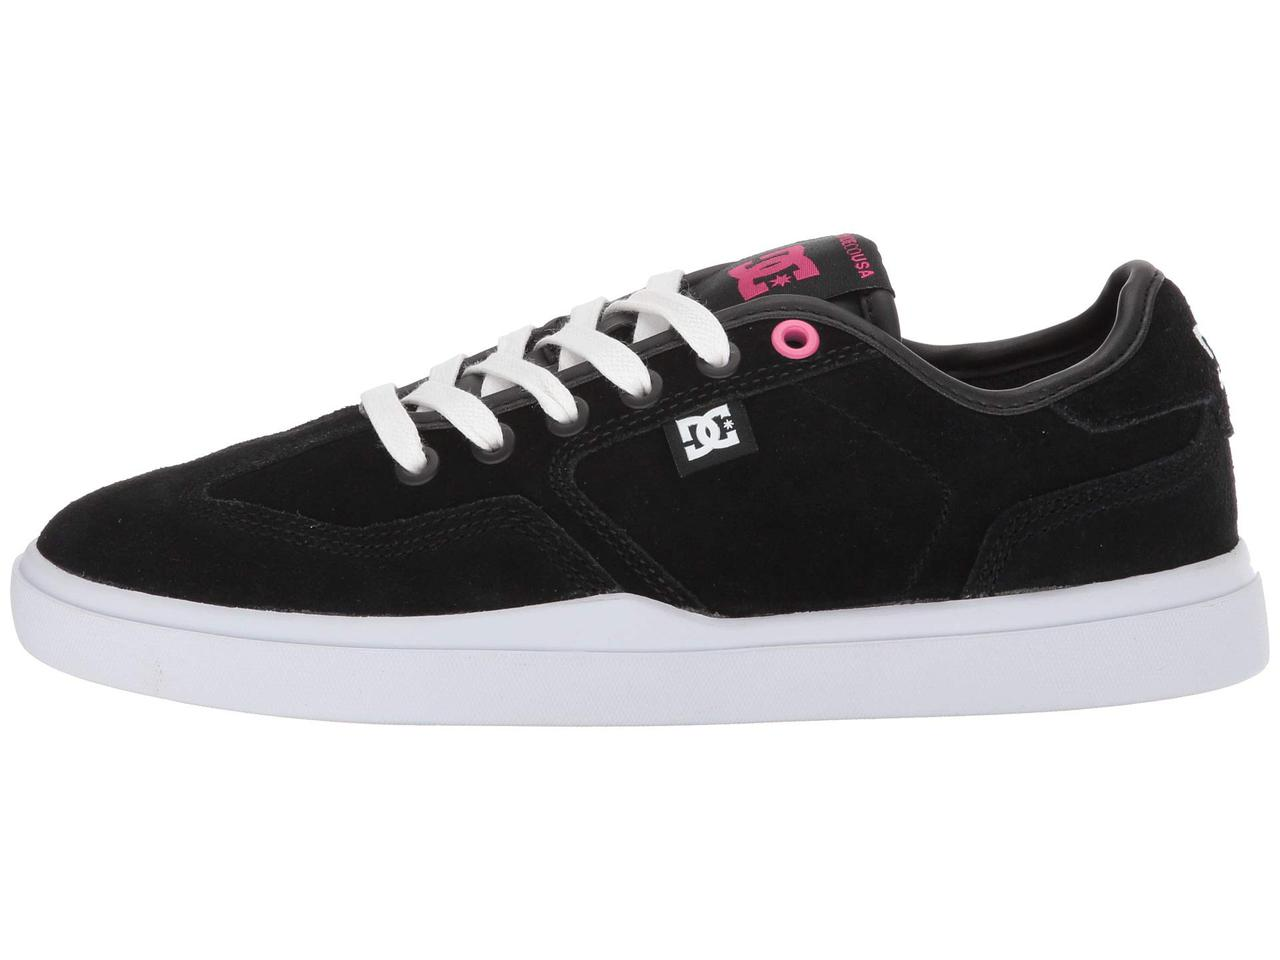 Кроссовки Кеды (Оригинал) DC Vestrey SE Black White Pink  продажа ... 080db881fb